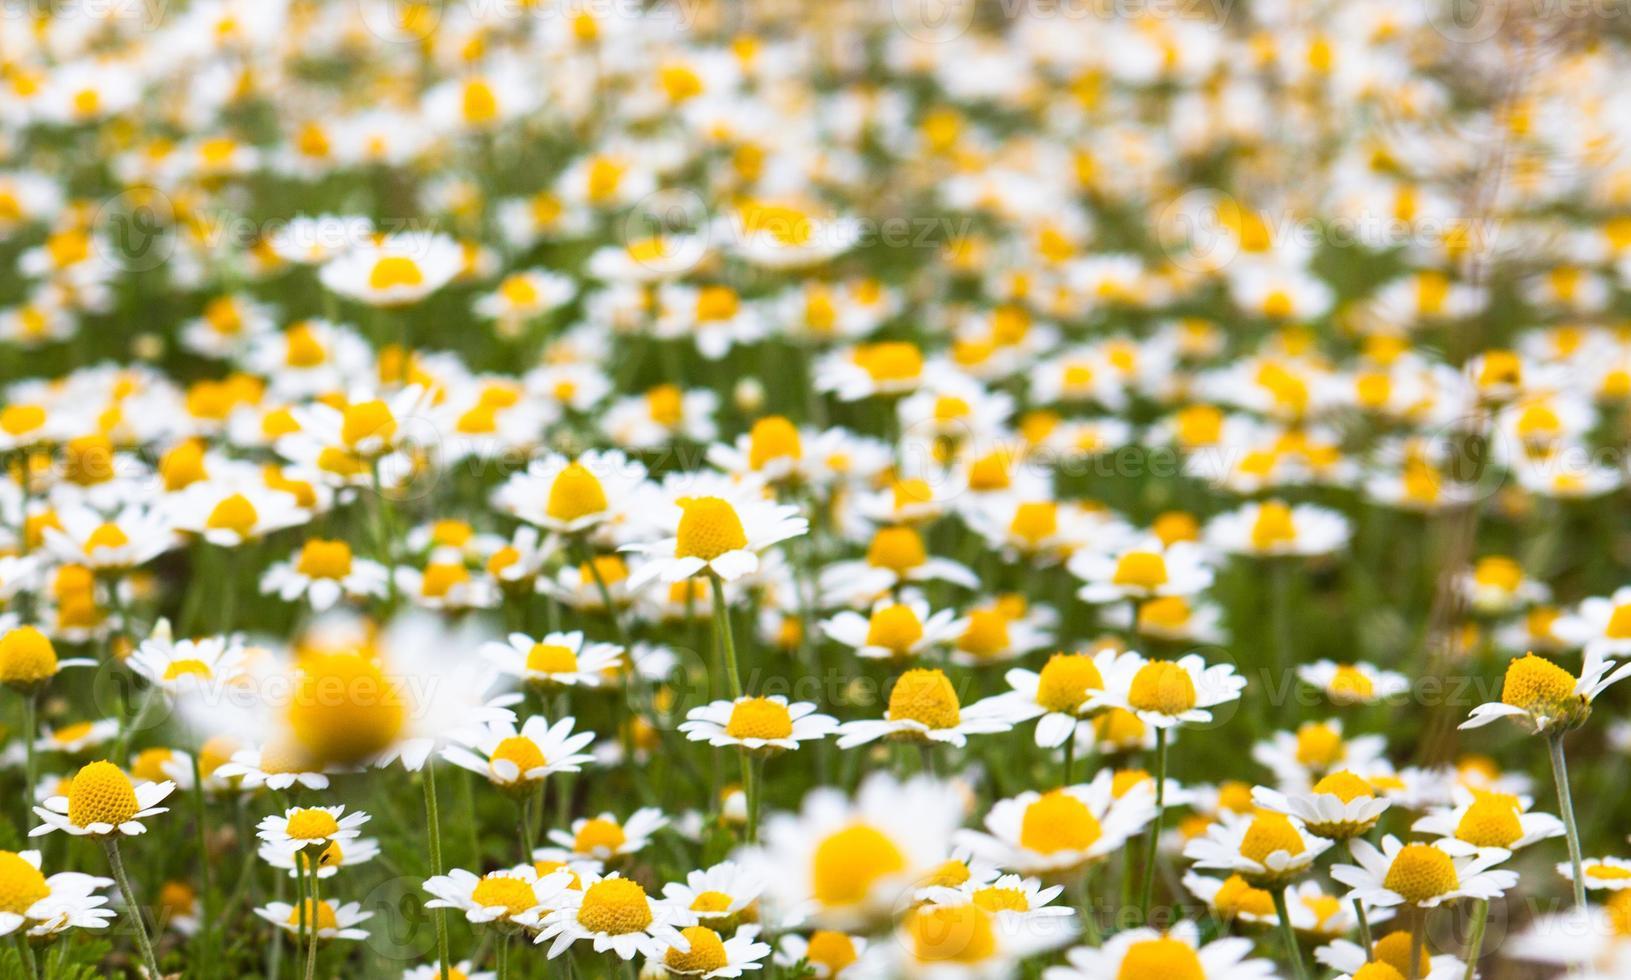 camomille en fleurs photo